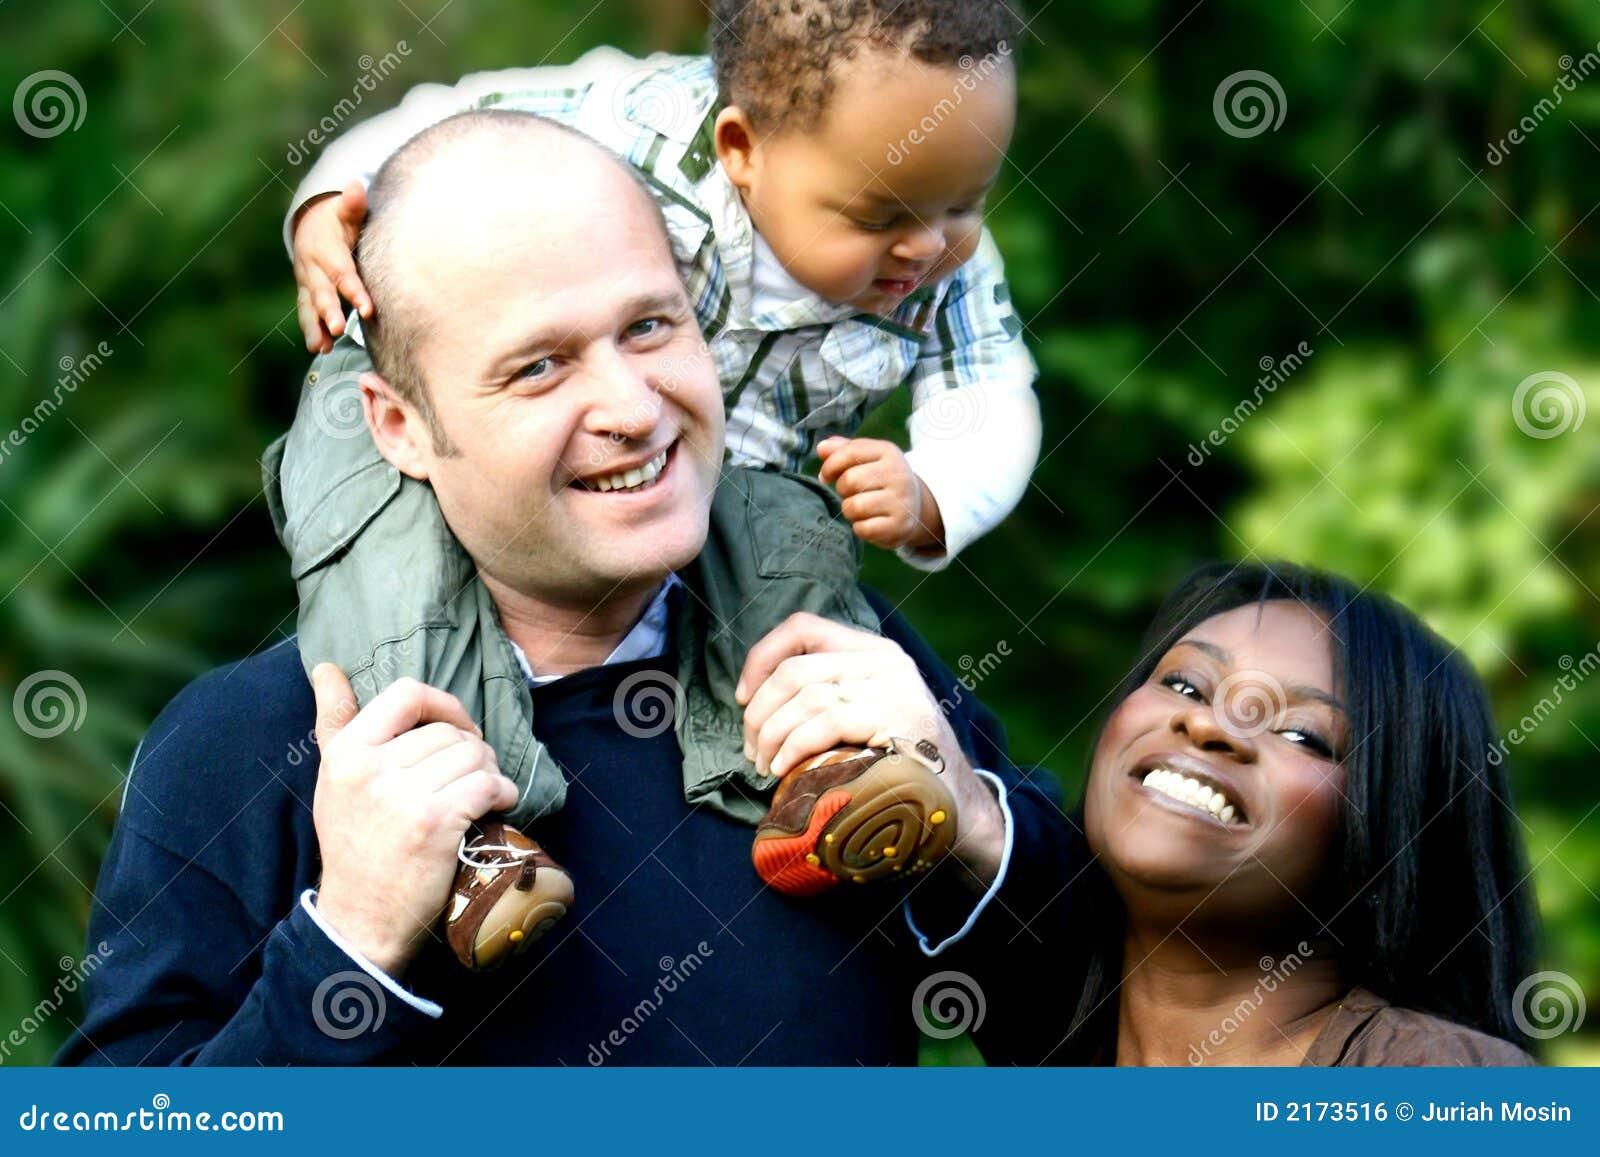 Family Diversity Royalty Free Stock Image - Image: 2173516